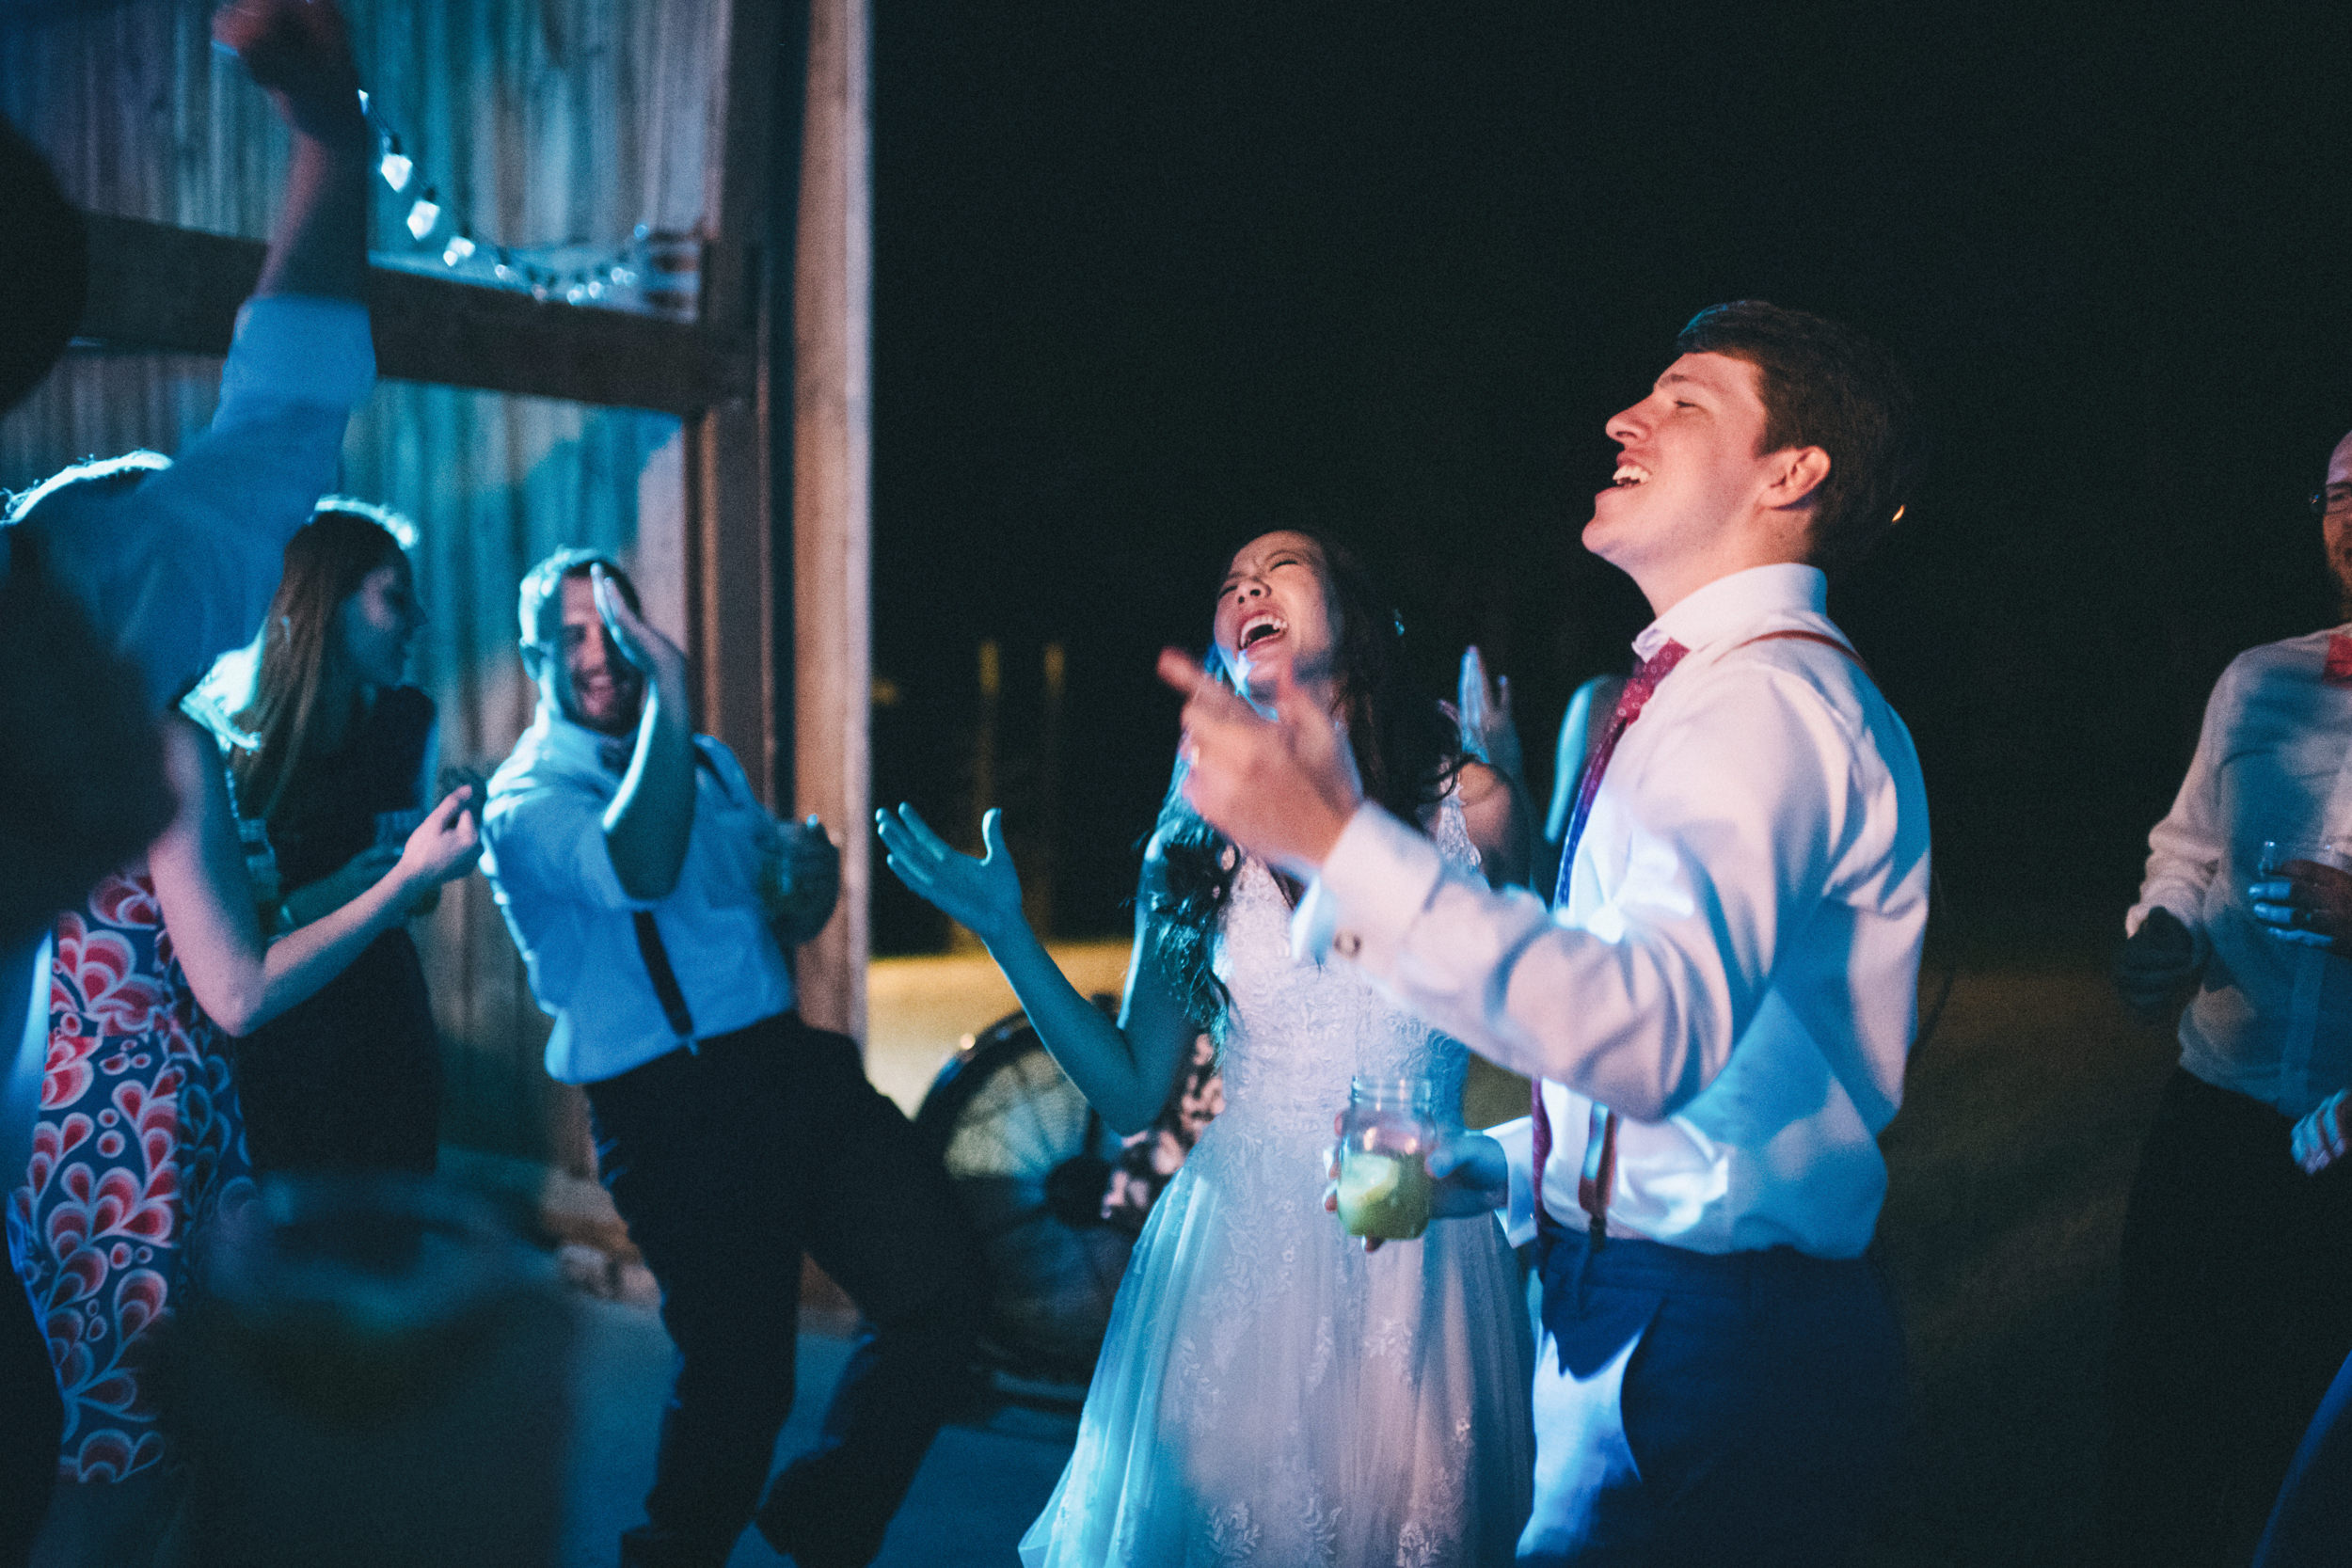 Louisville-Kentucky-Wedding-and-Elopement-Photographer-Sarah-Katherine-Davis-Photography-Summer-Jewel-Toned-Wedding-Chineese-Tea-Ceremony-Warrenwood-Manor-Danville-1069.jpg